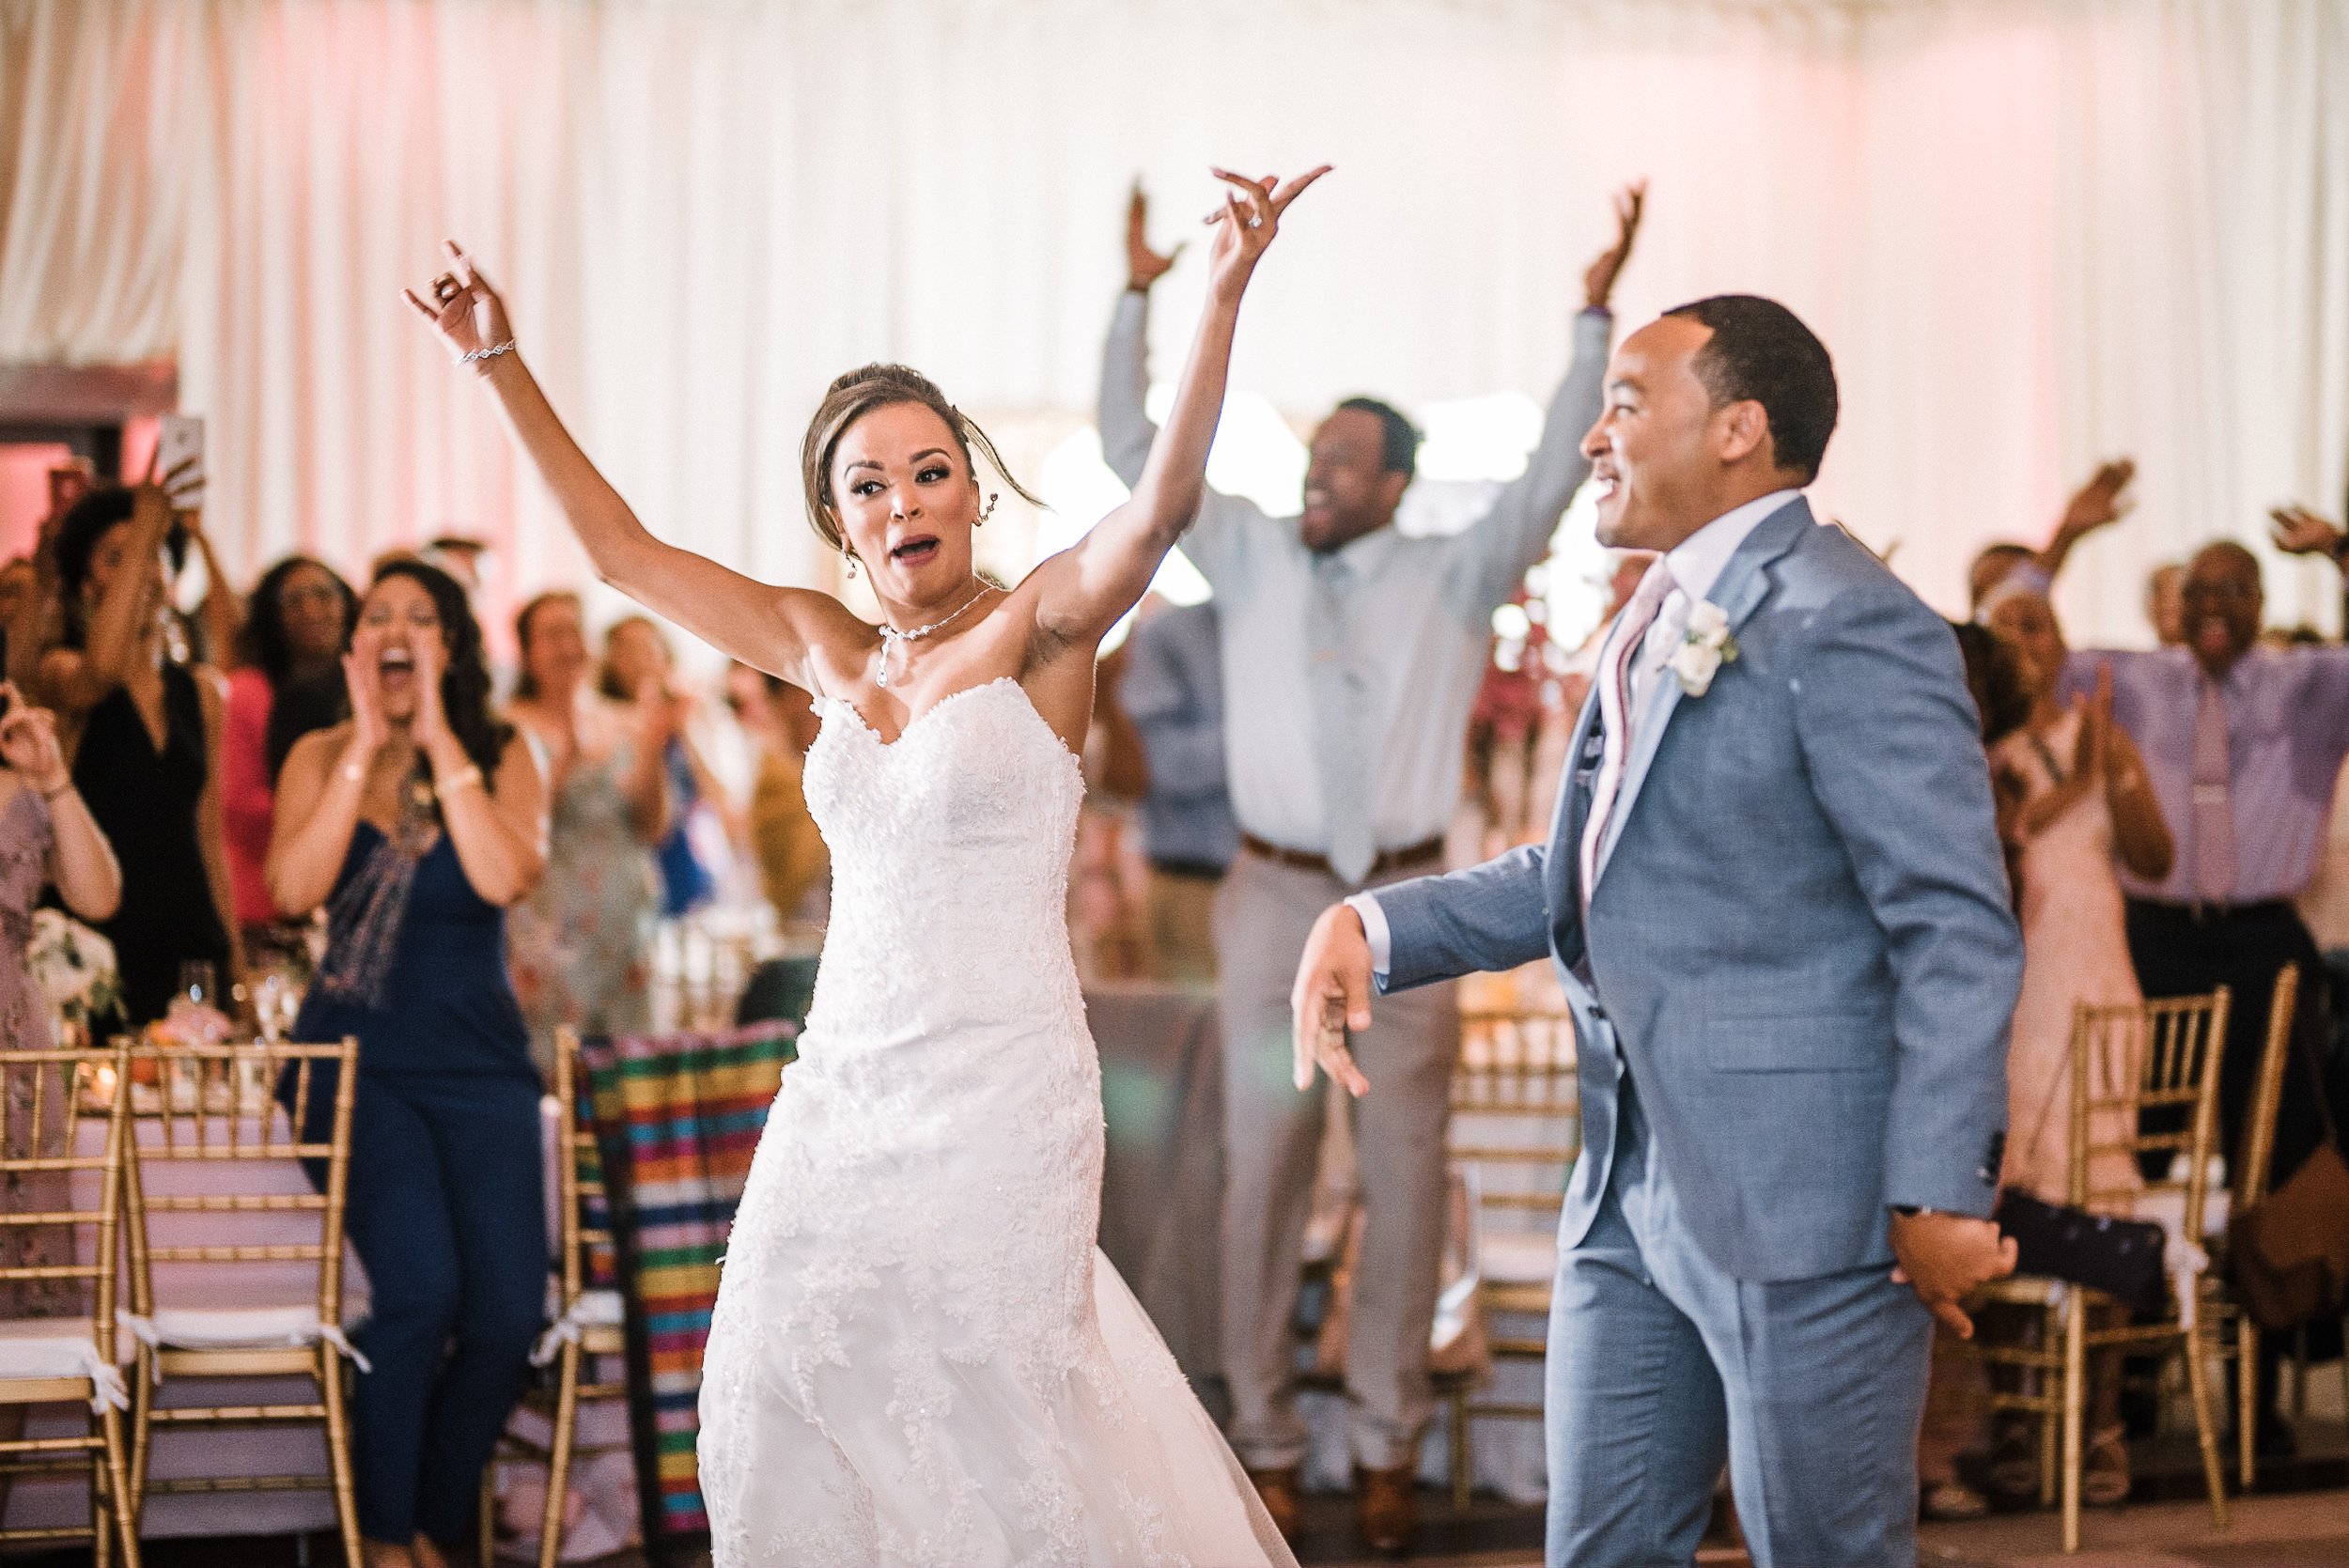 bride and groom entering reception at The Park Hyatt Hotel in Washington DC